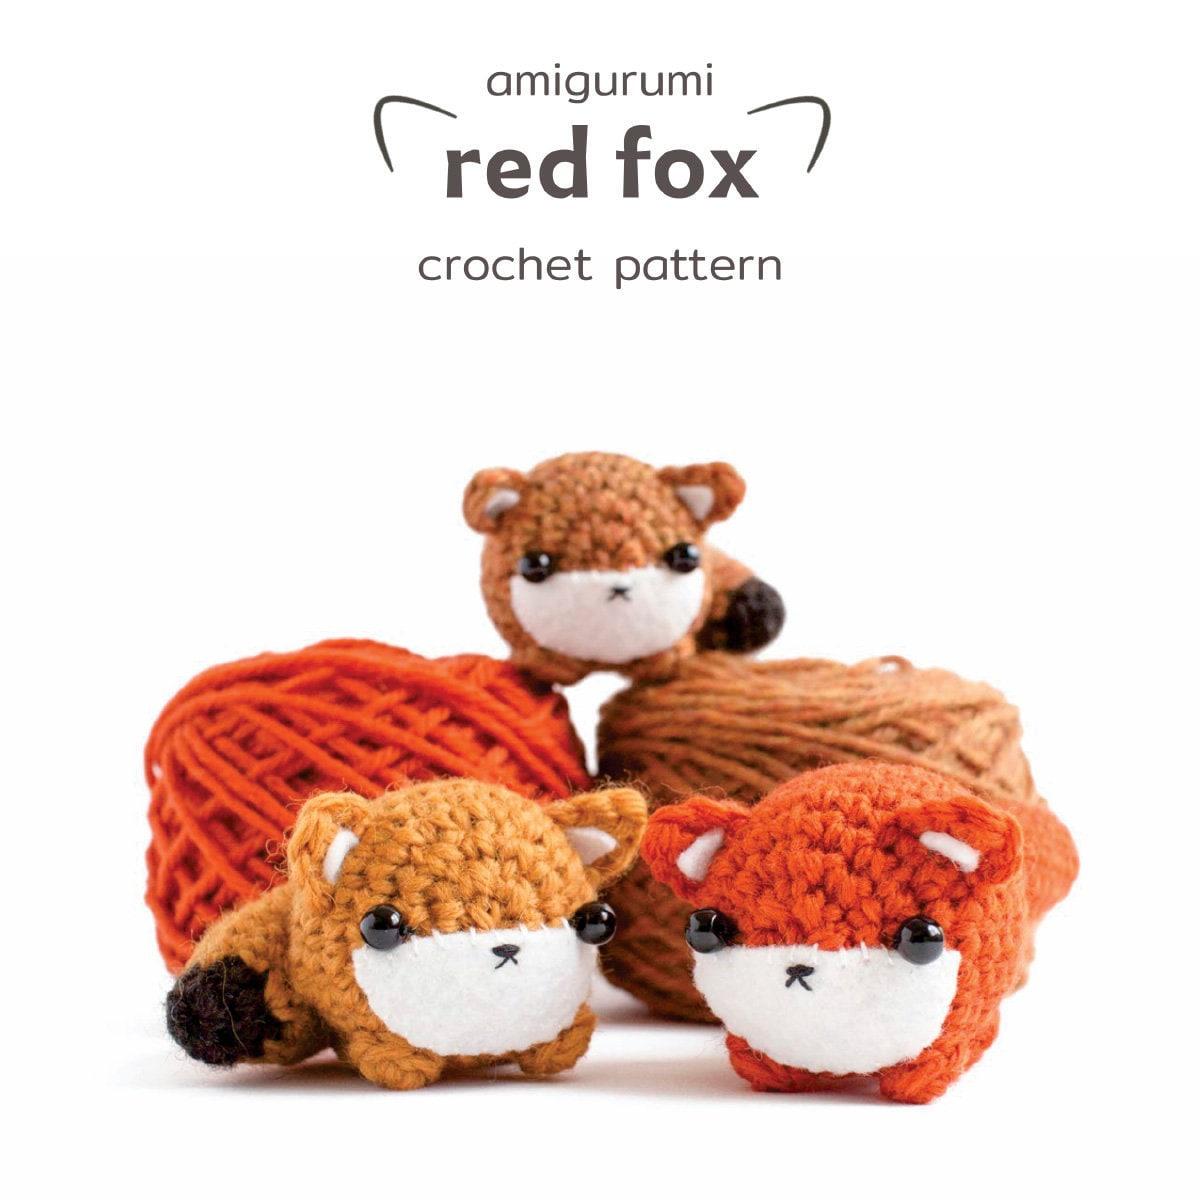 Red fox amigurumi crochet pattern animal doll fox in knitted | Etsy | 1200x1200